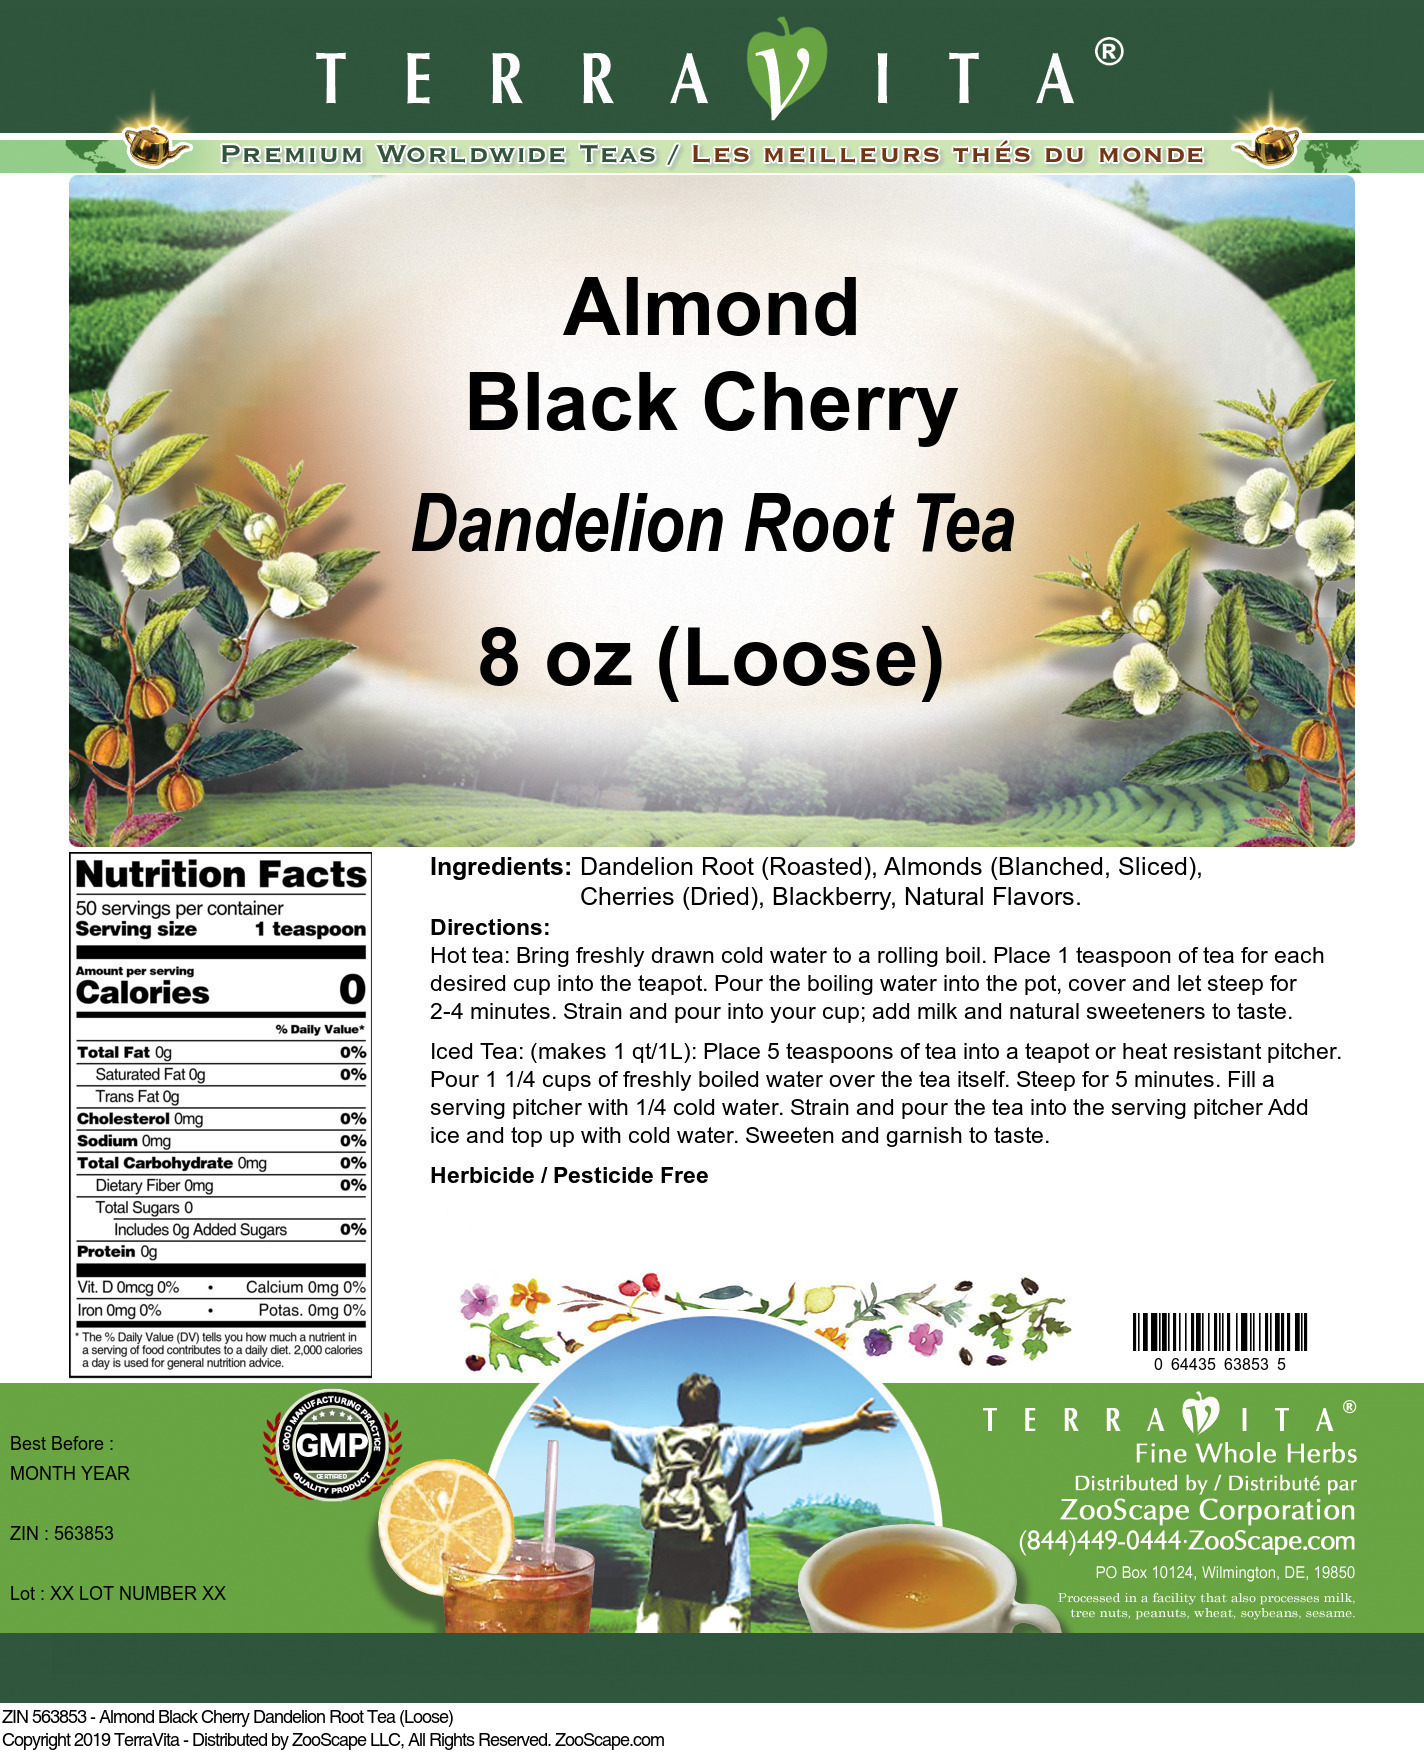 Almond Black Cherry Dandelion Root